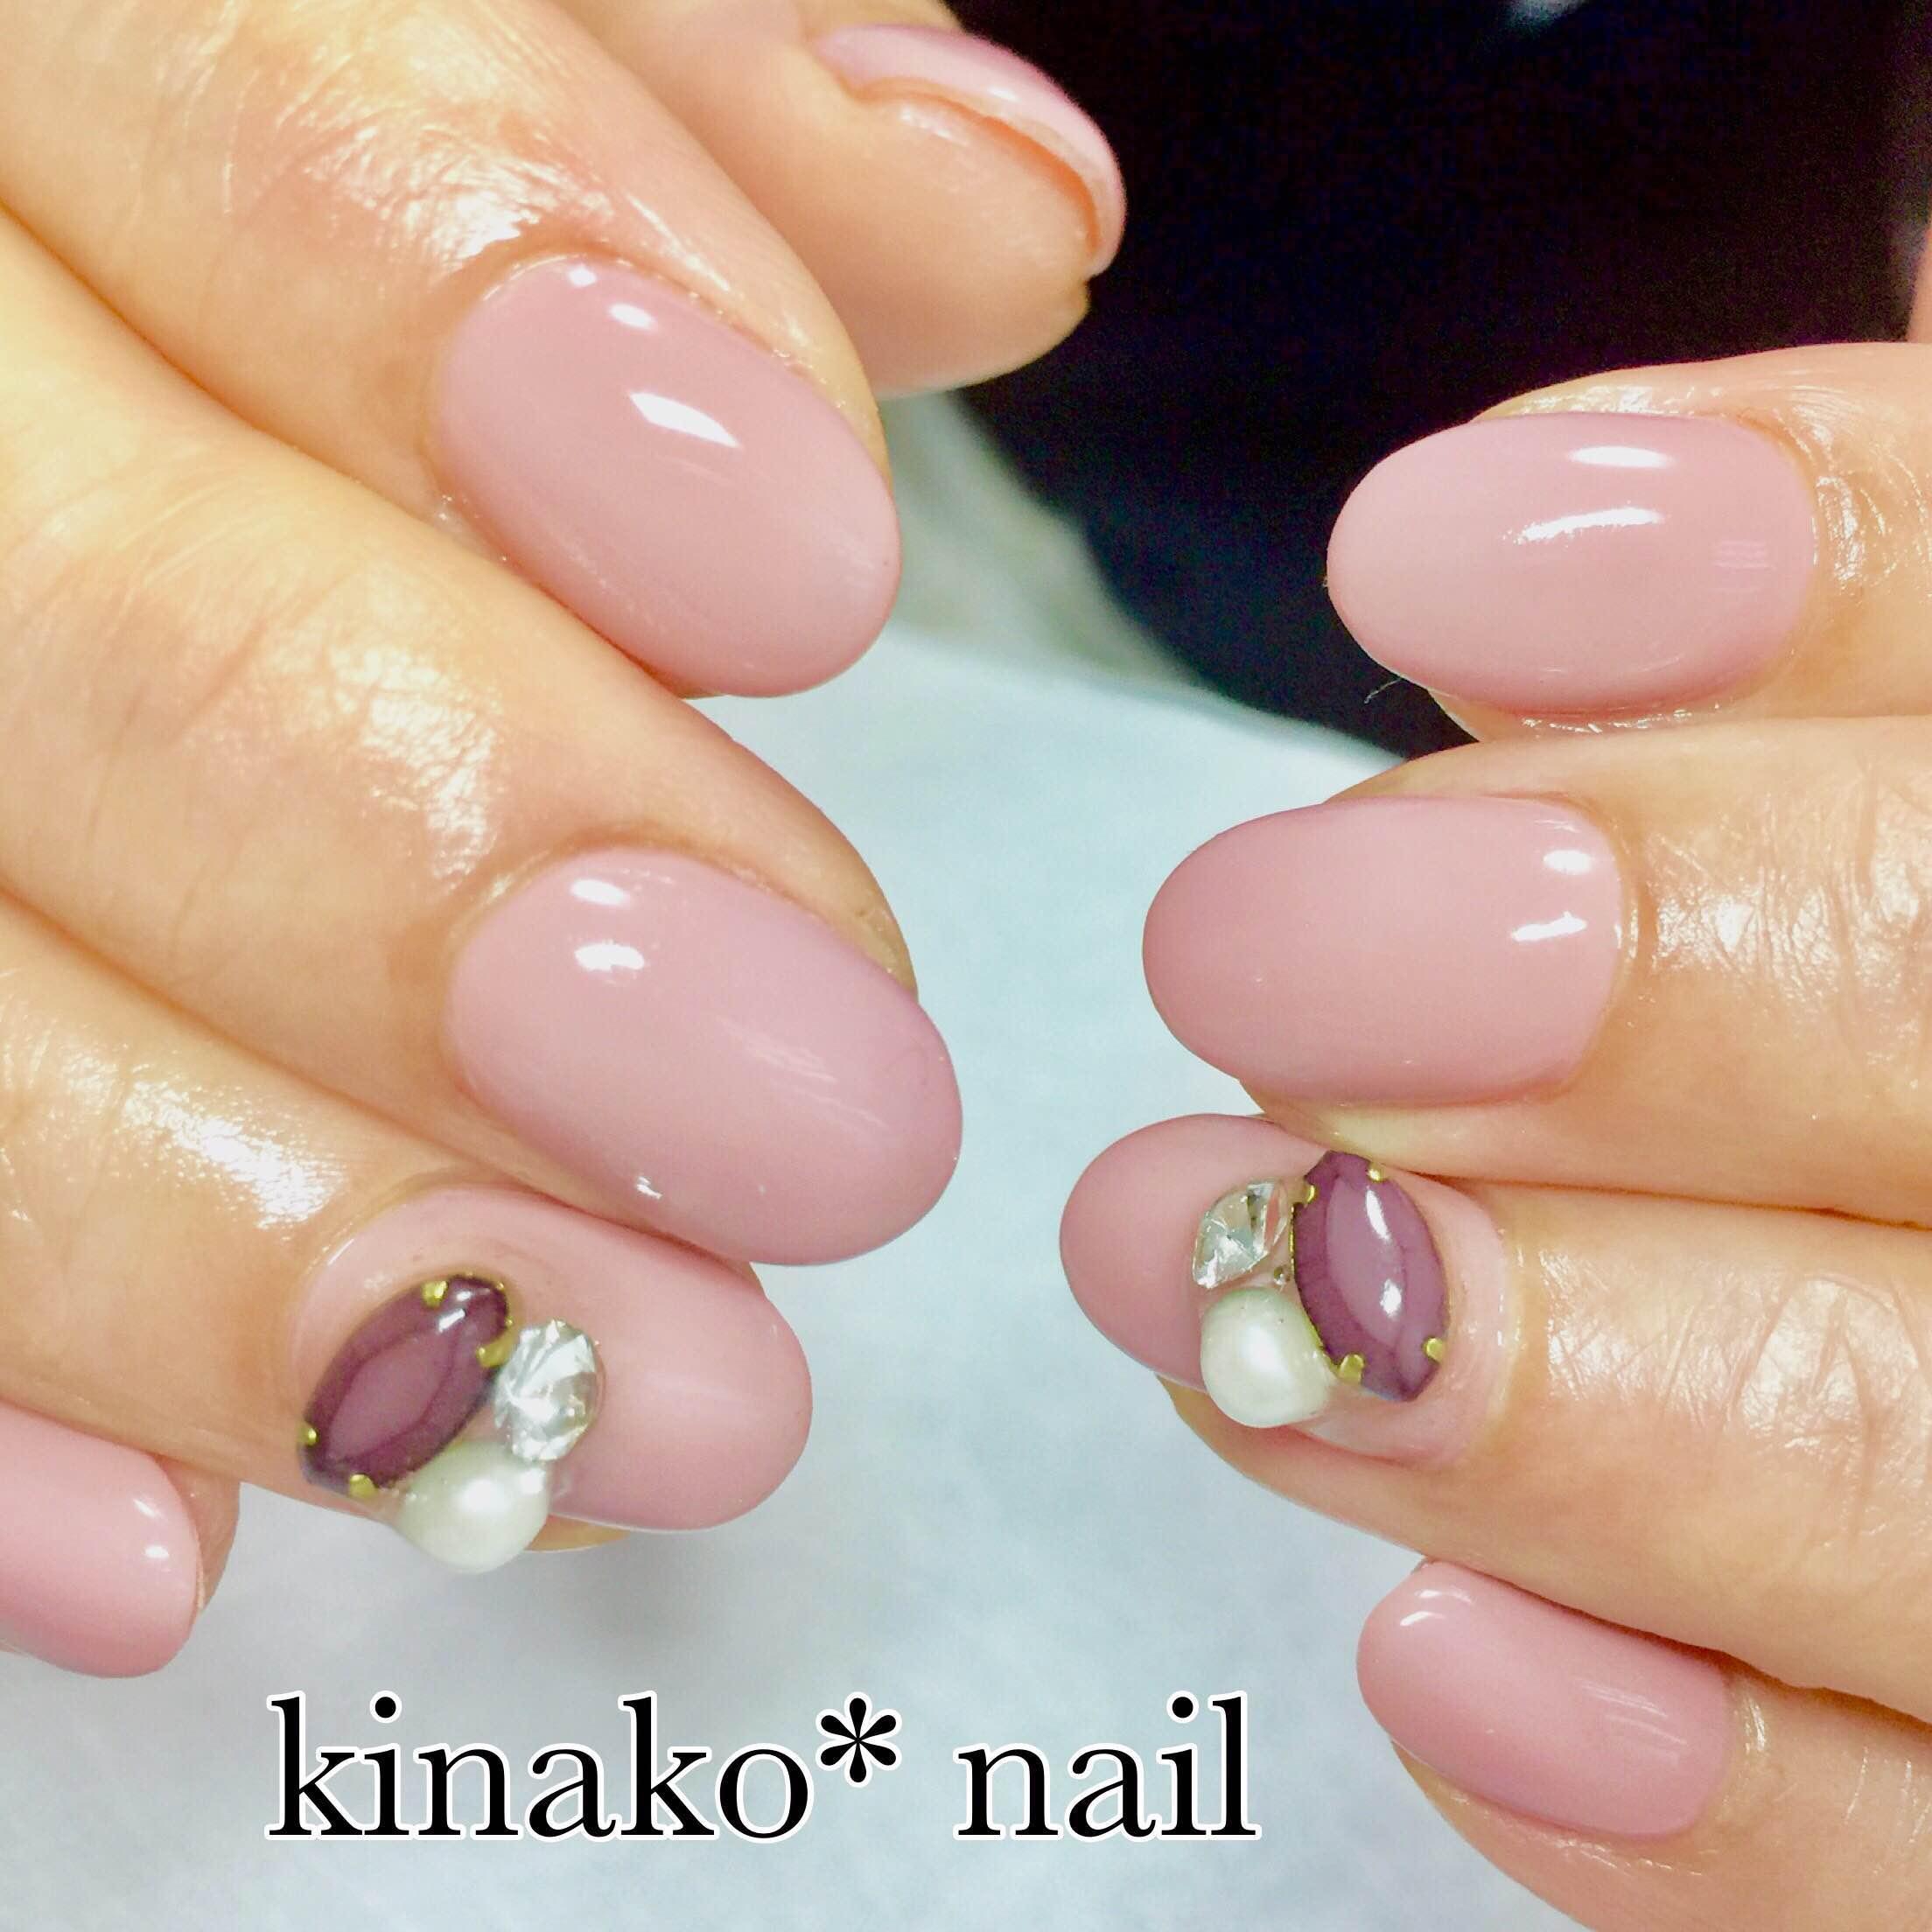 kinako* nailのネイル